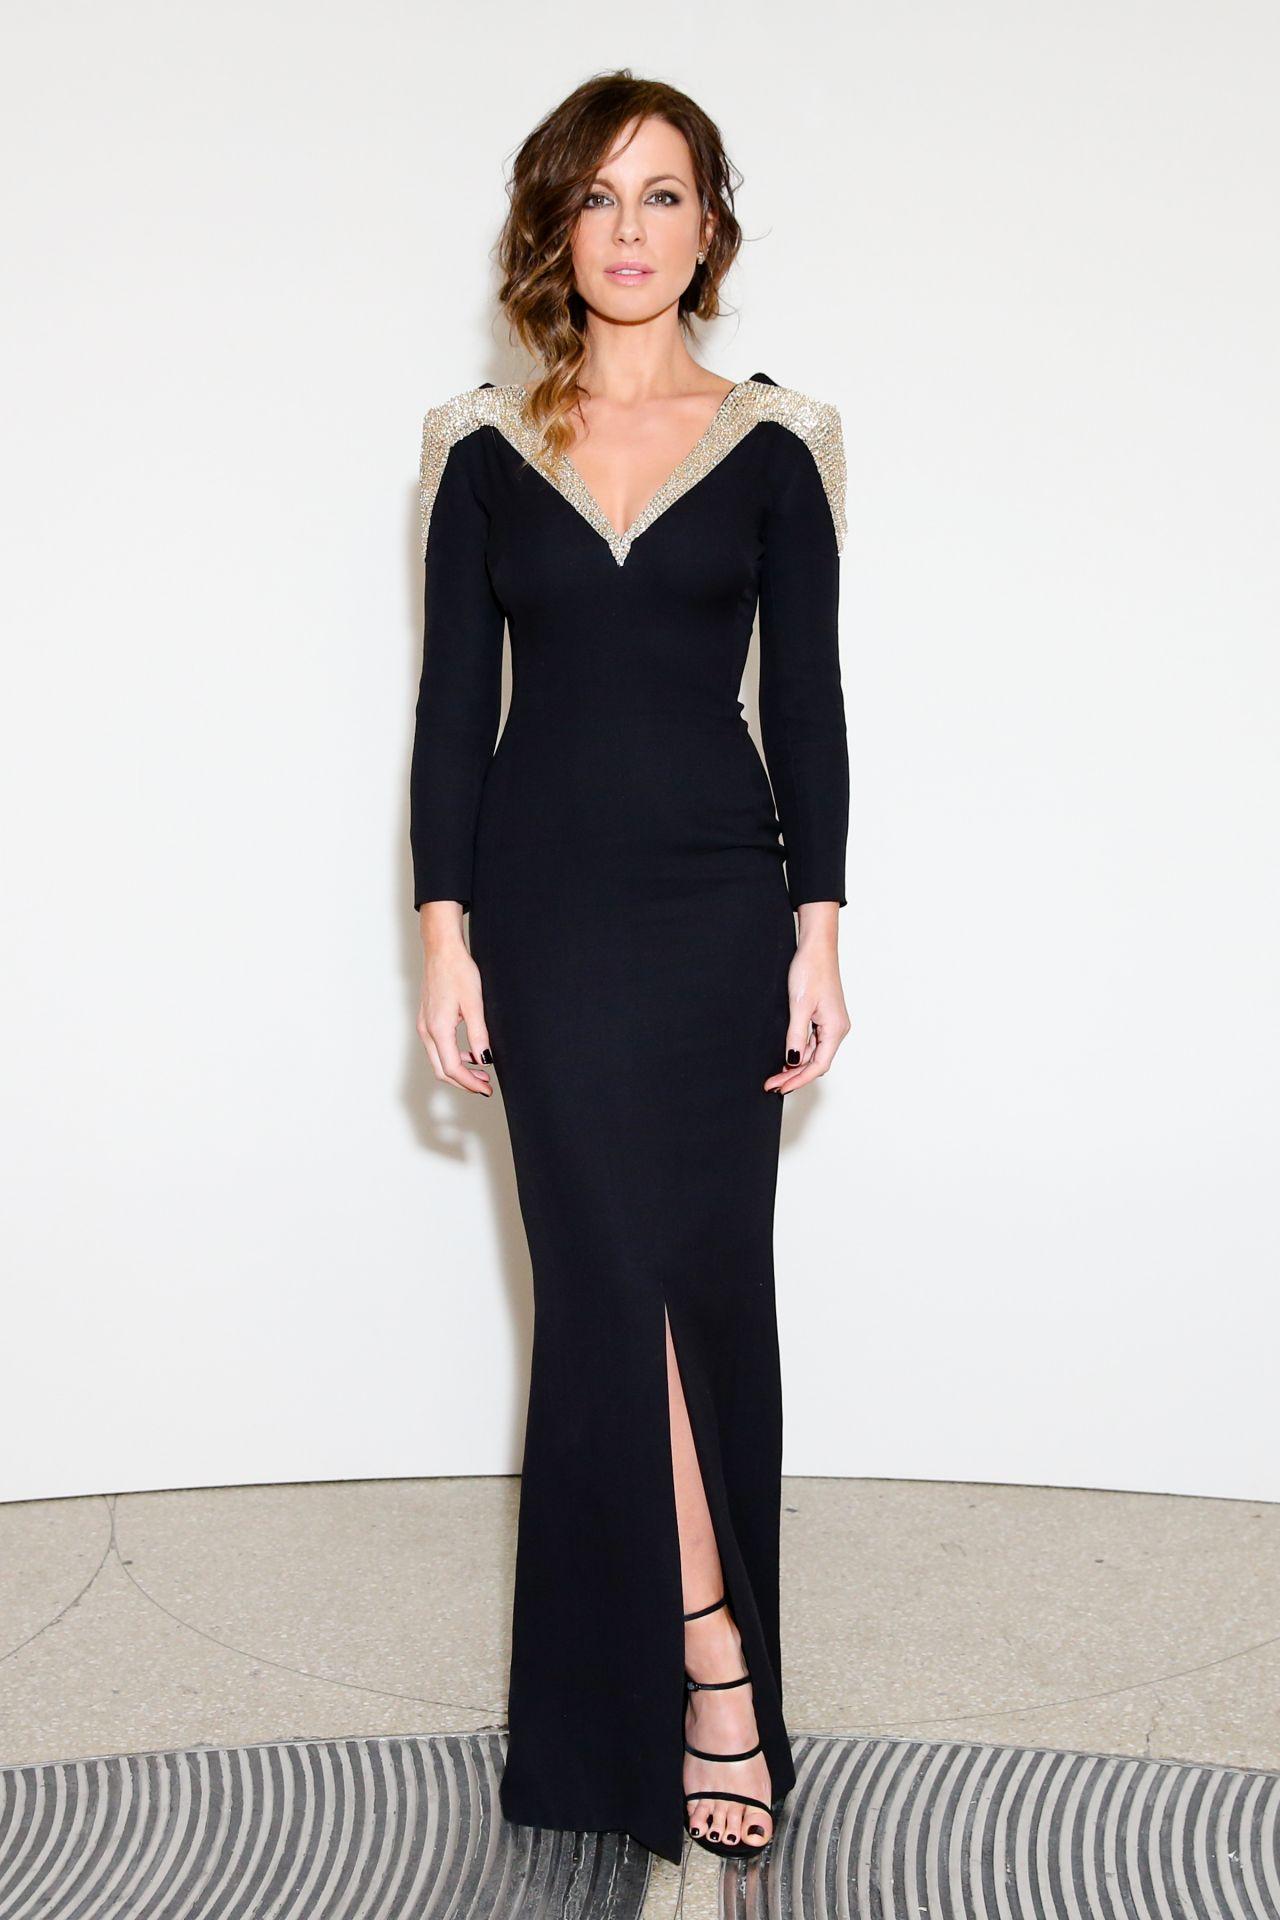 Kate Beckinsale Guggenheim International Gala Dinner In